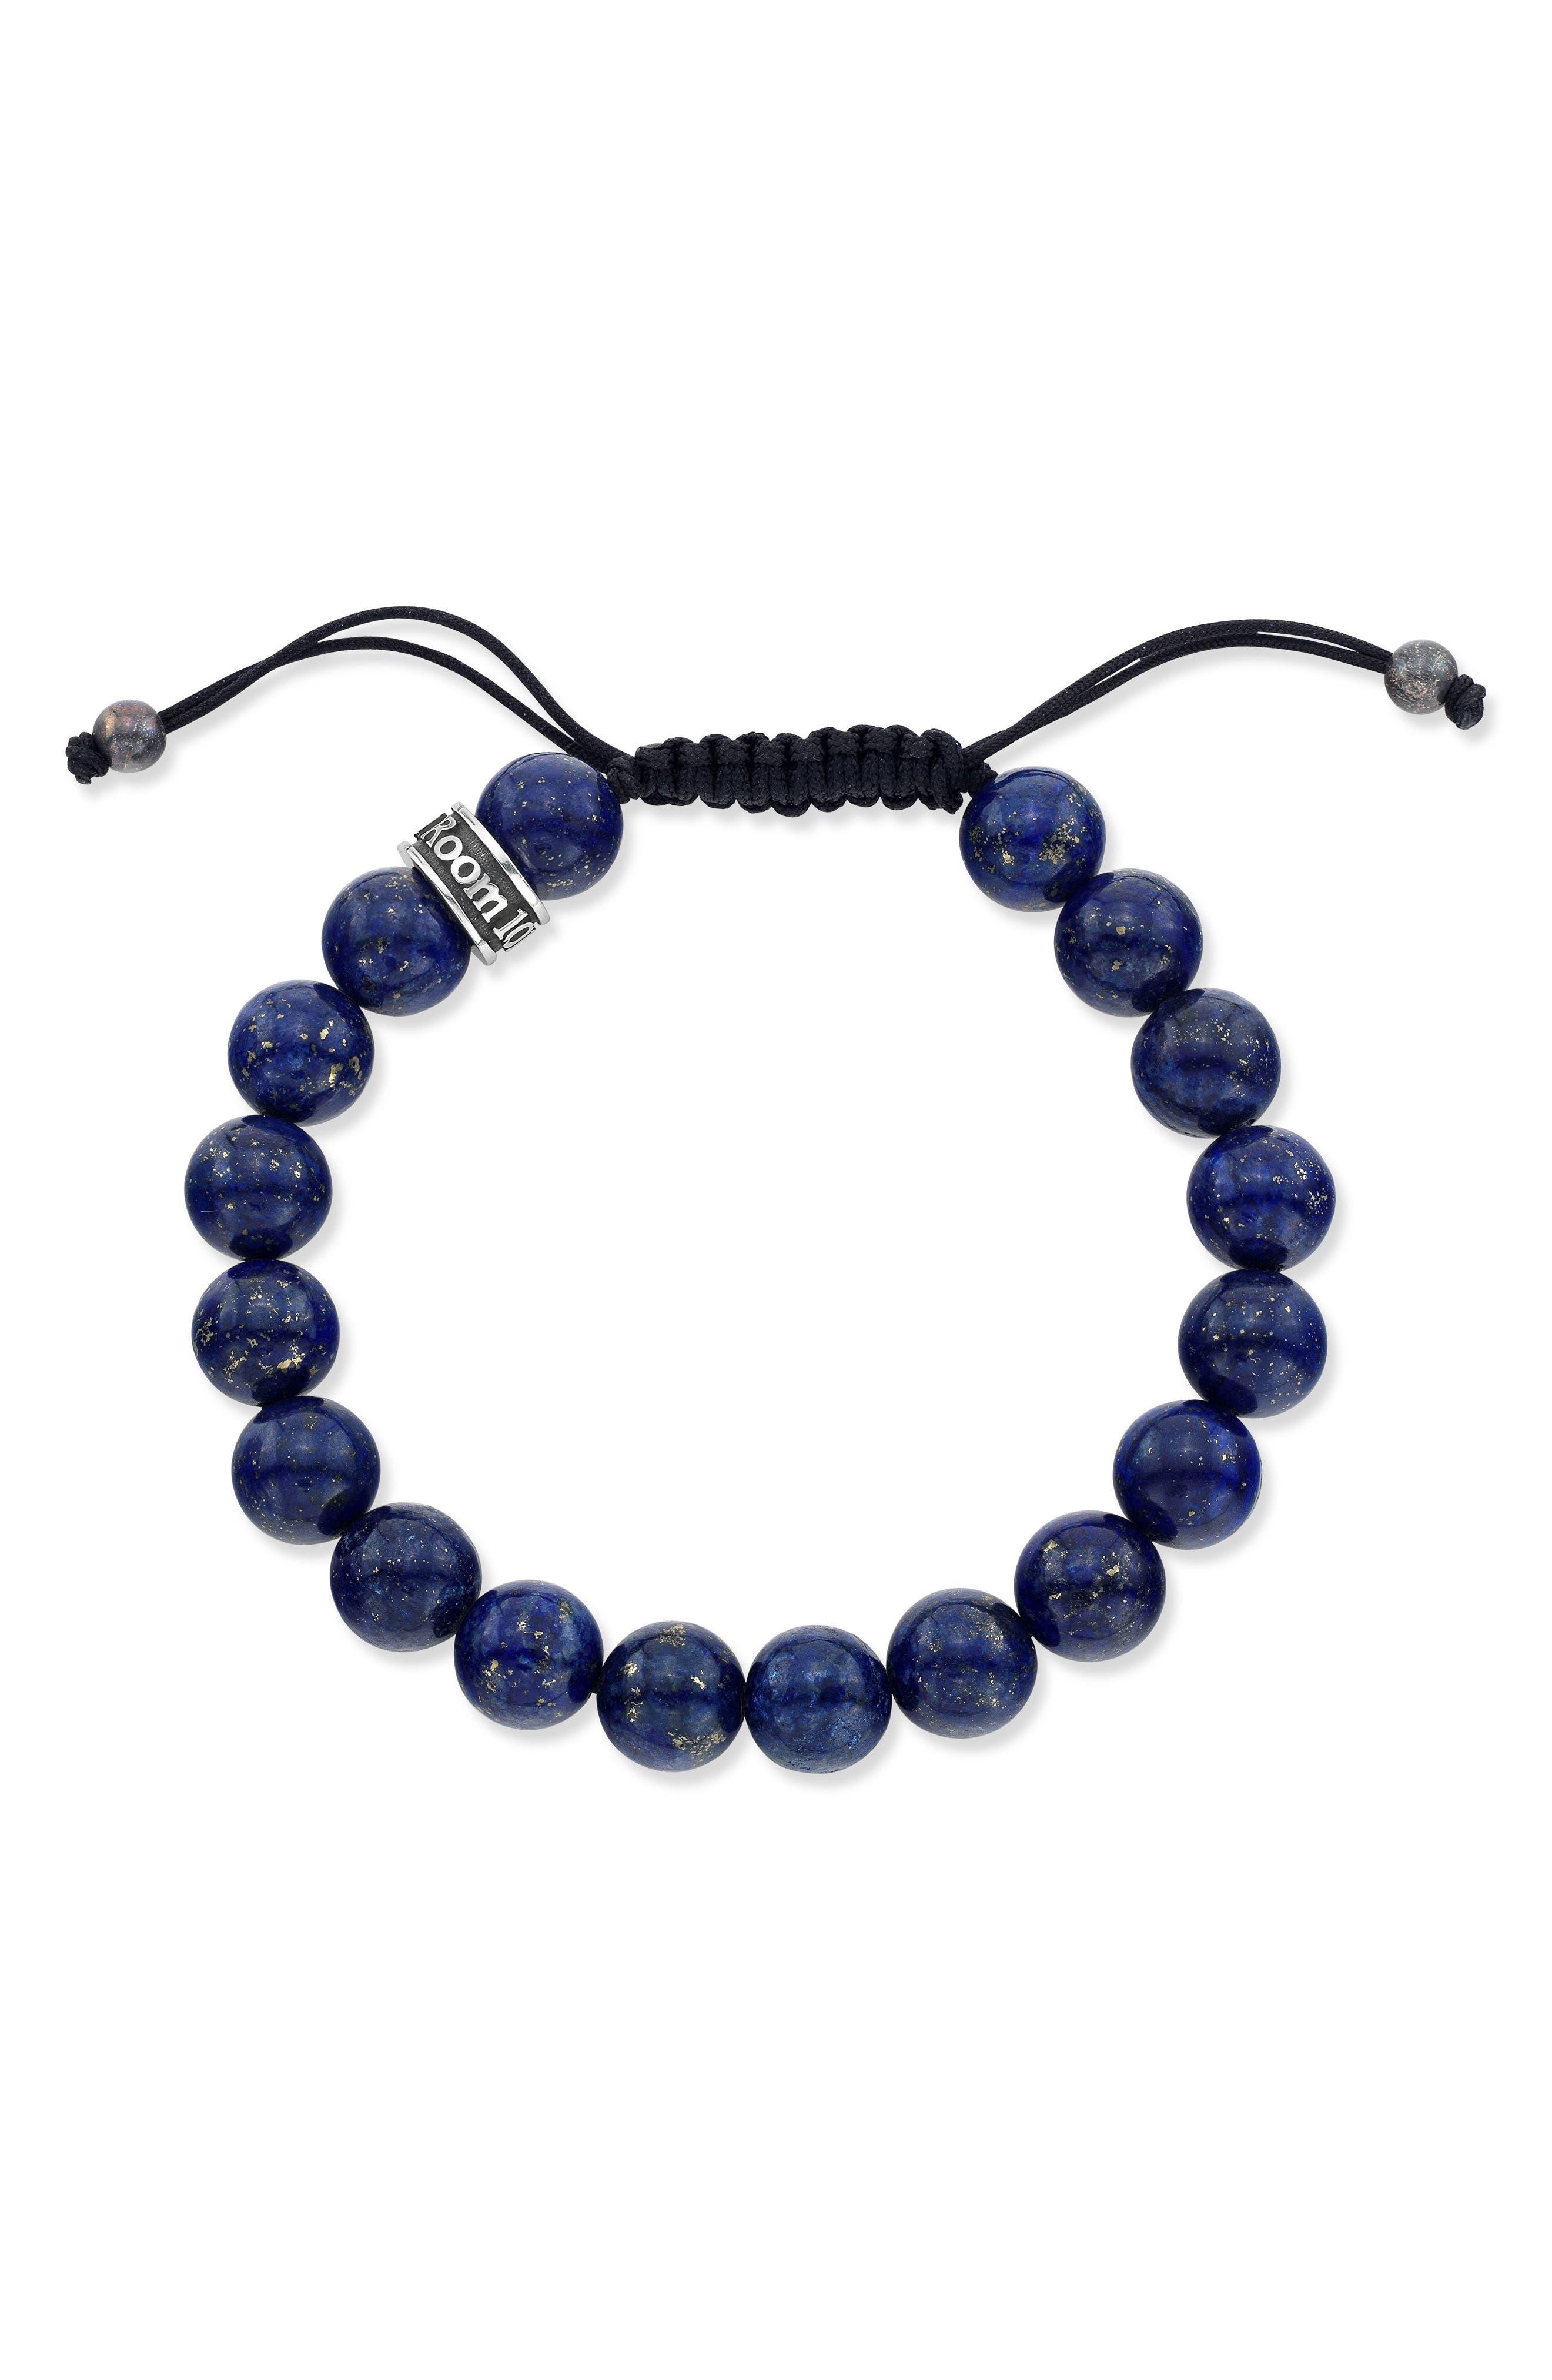 Lapis Lazuli Bead Shamballa Bracelet,                         Main,                         color, Blue